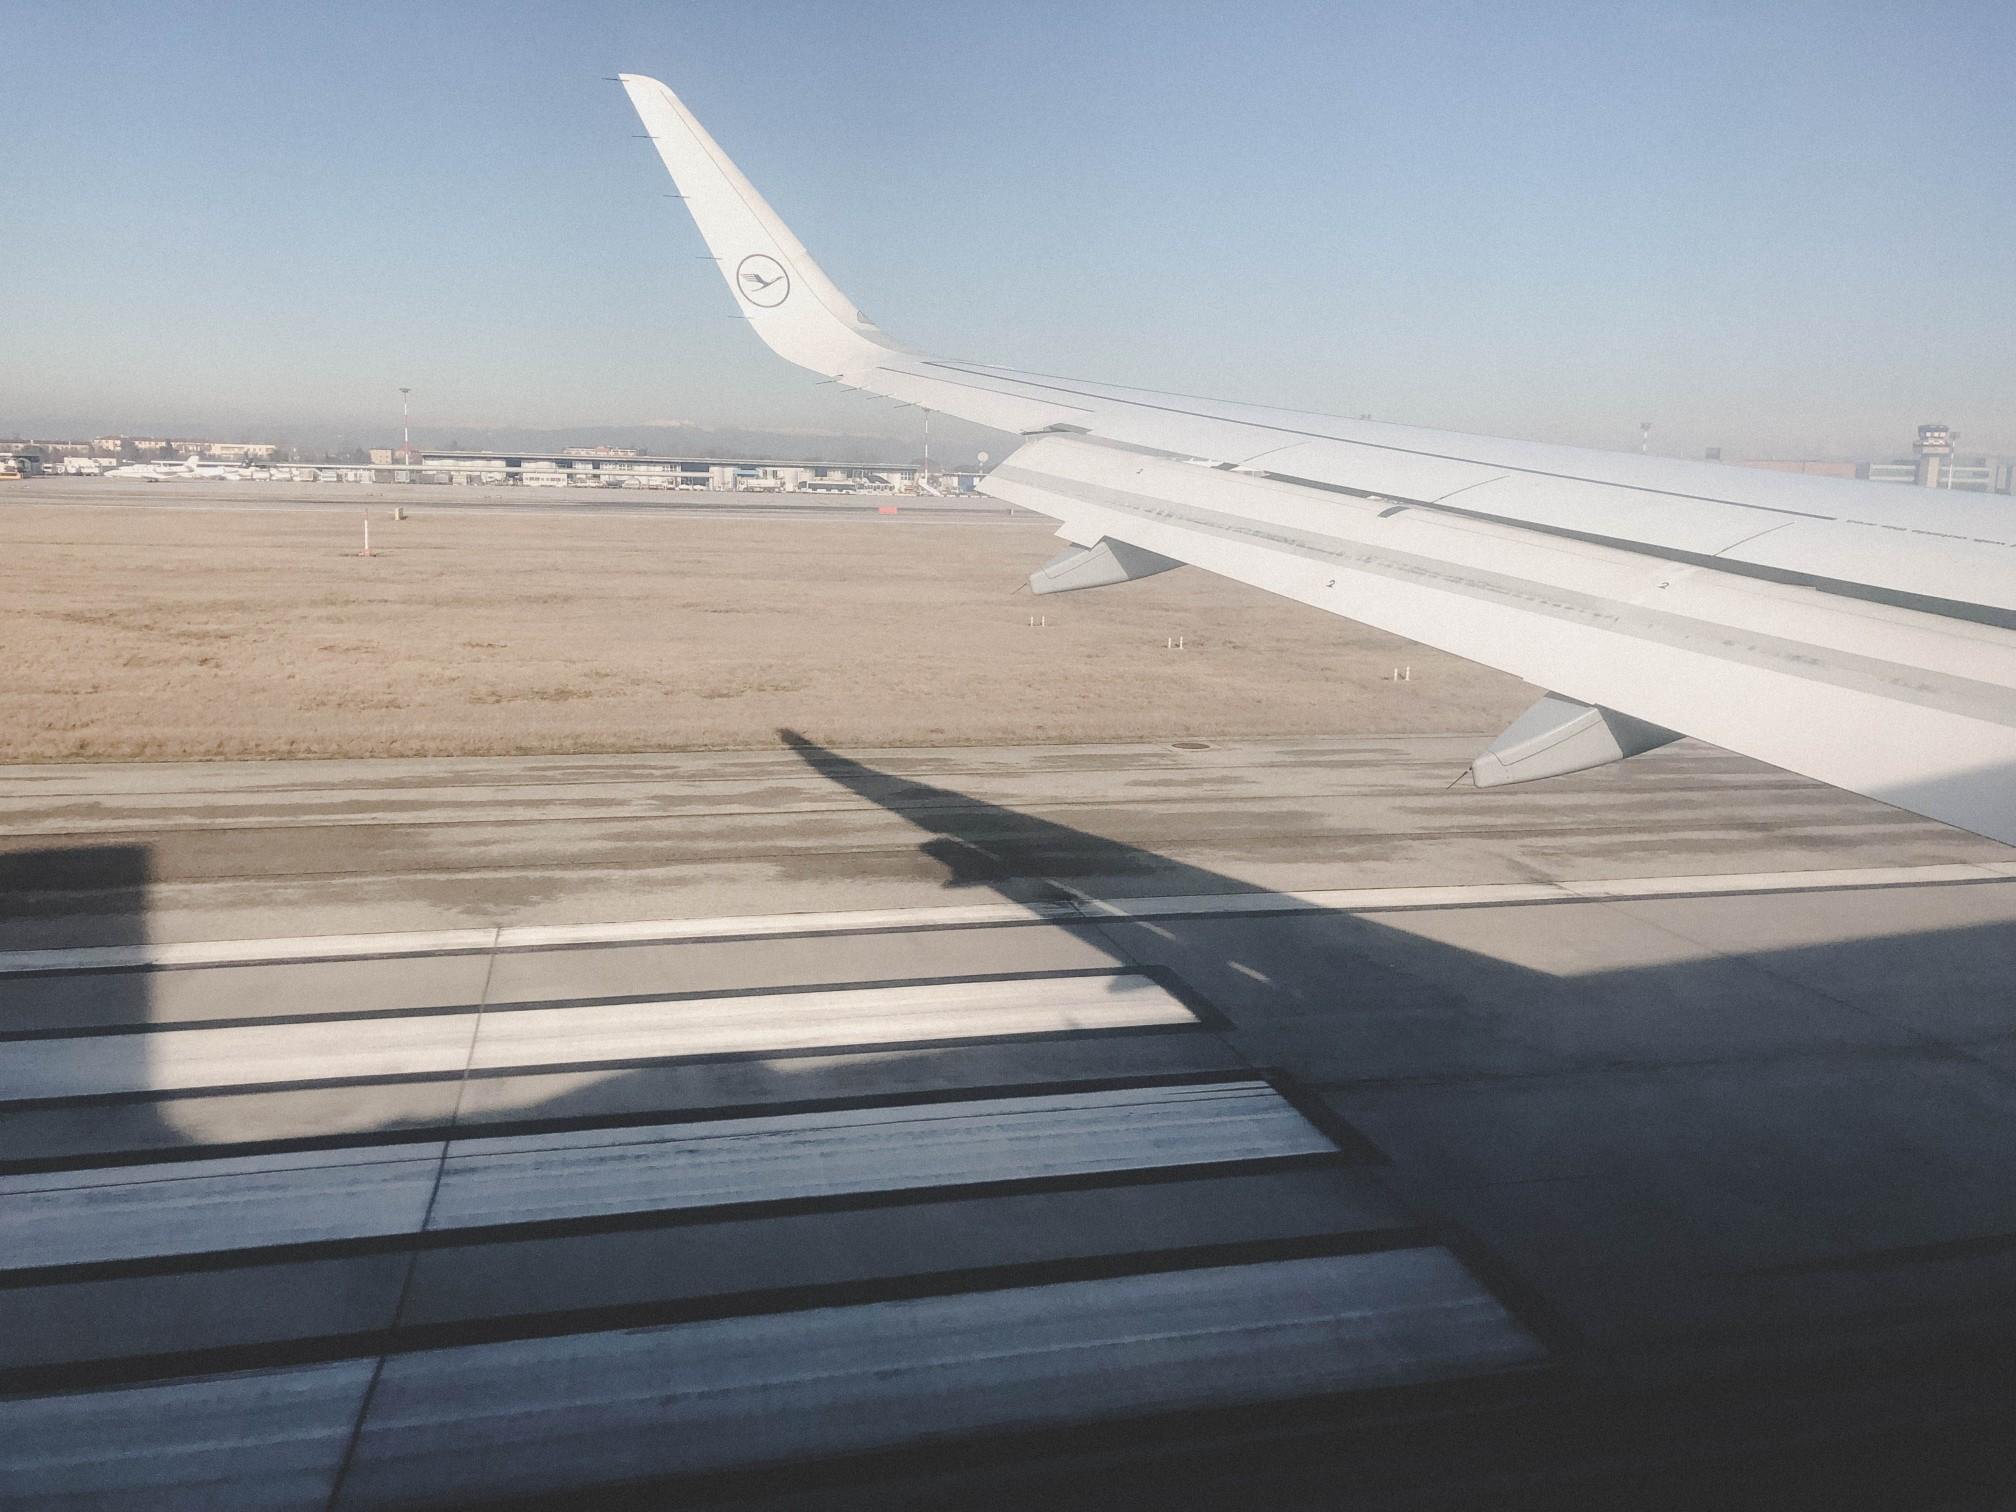 lennuõnnetust tallinna lennujaamas